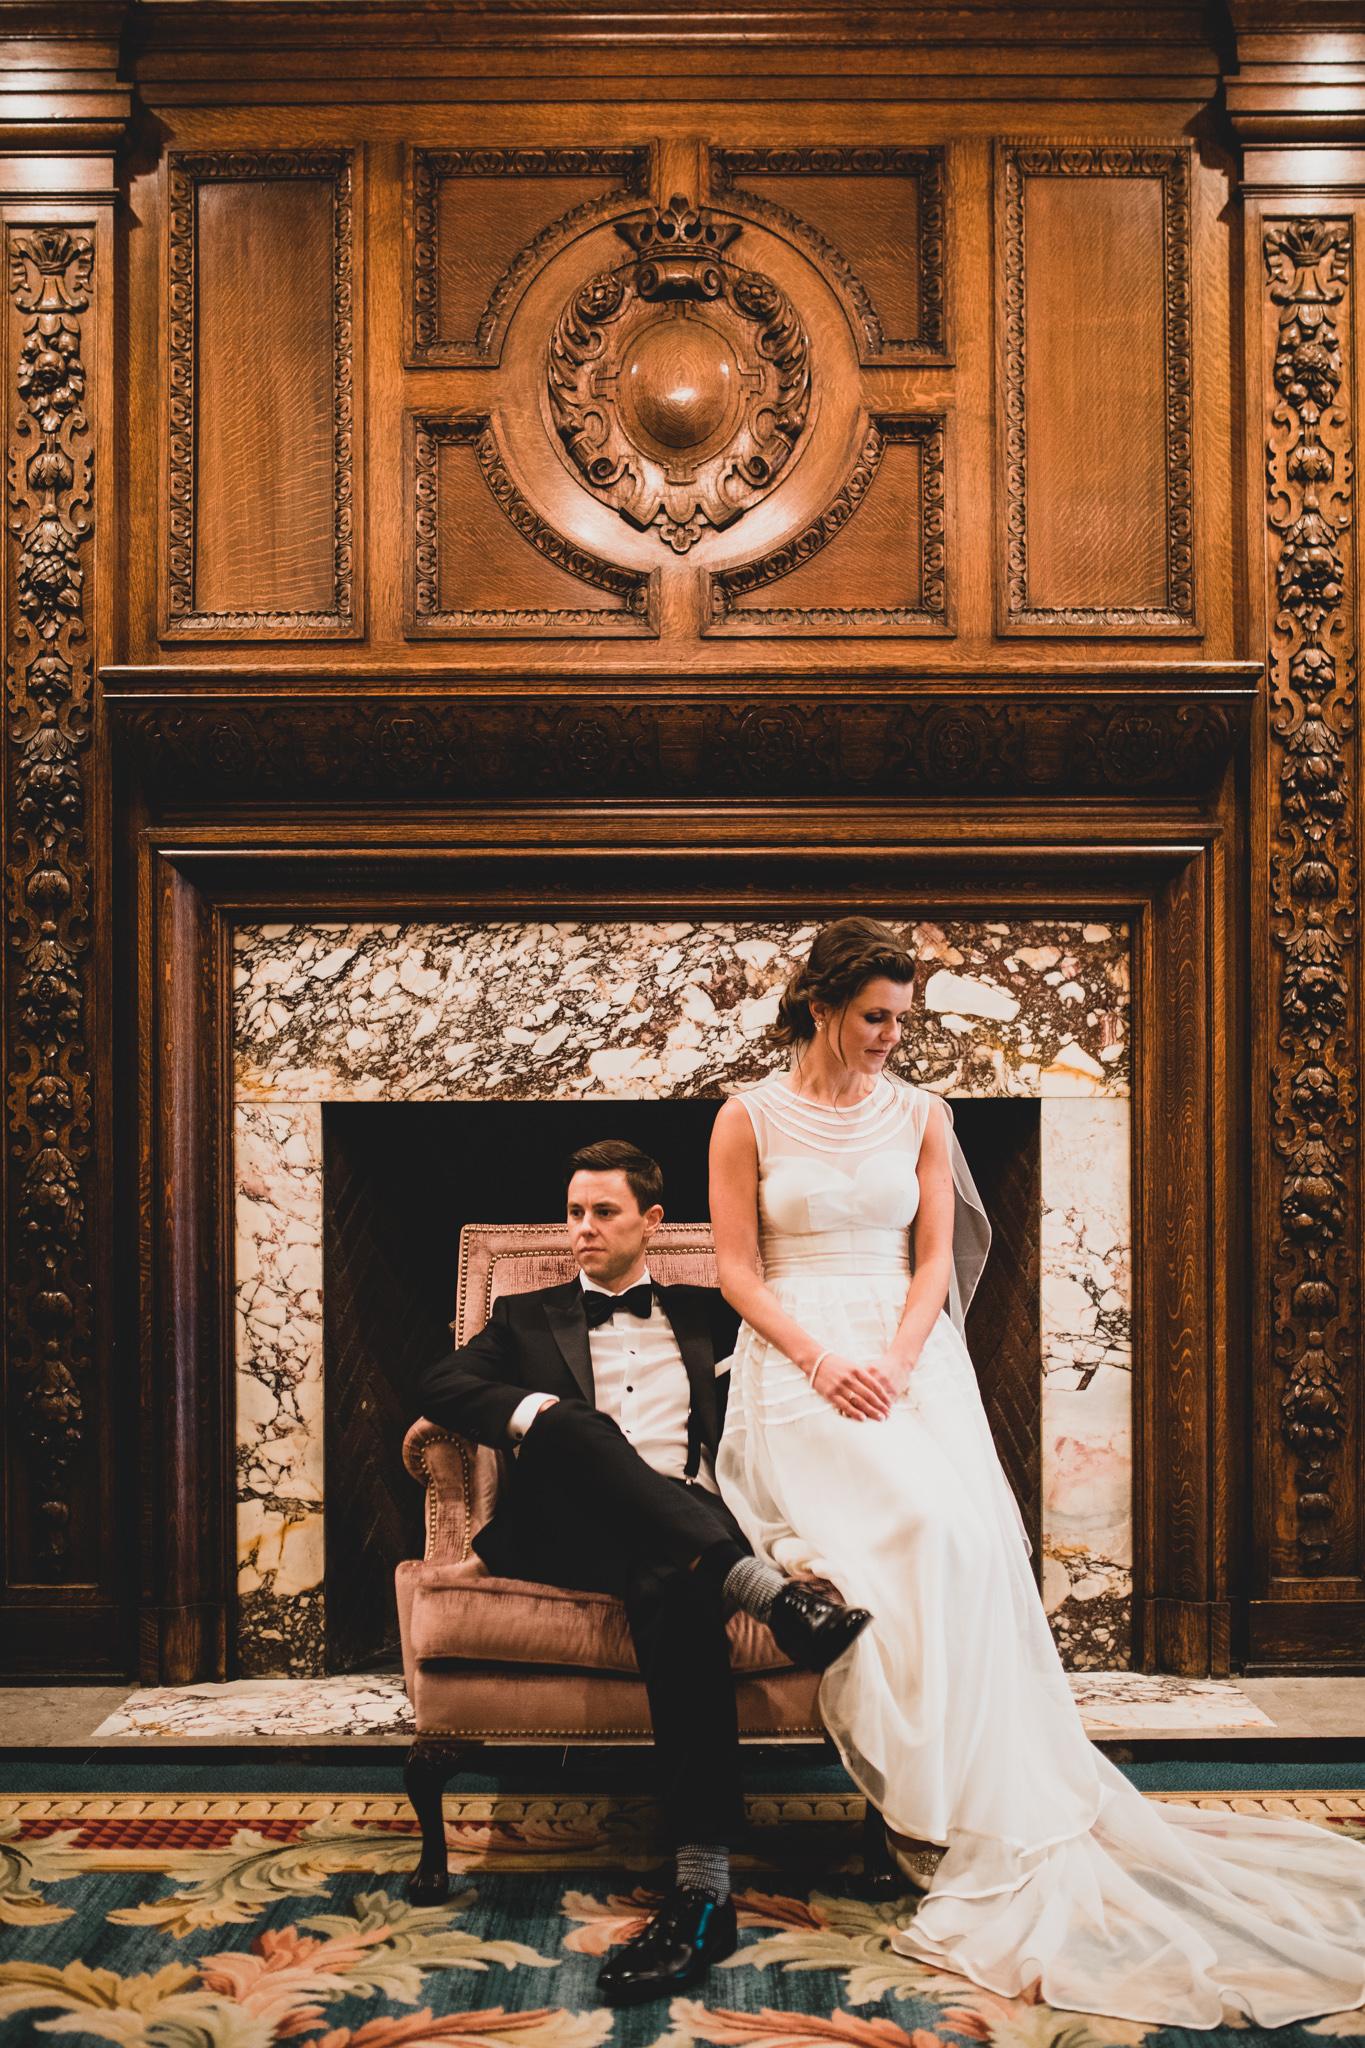 366-WEB-Jonathan-Kuhn-Photography-Amanda-Brennan-Wedding-0526.jpg